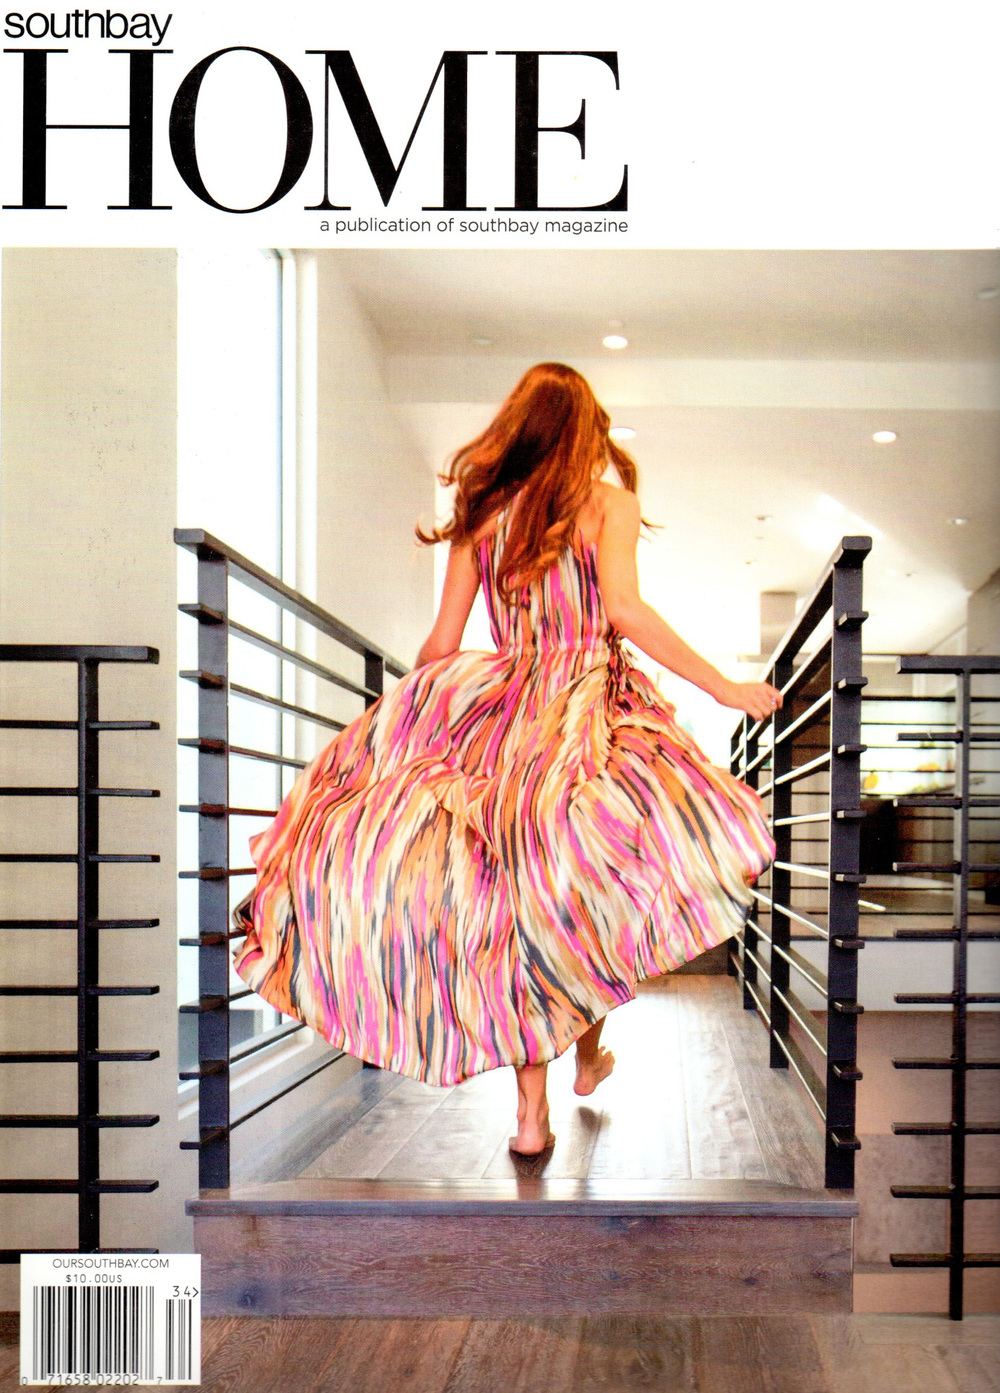 southbay-home-2013-volume-4-0.jpg